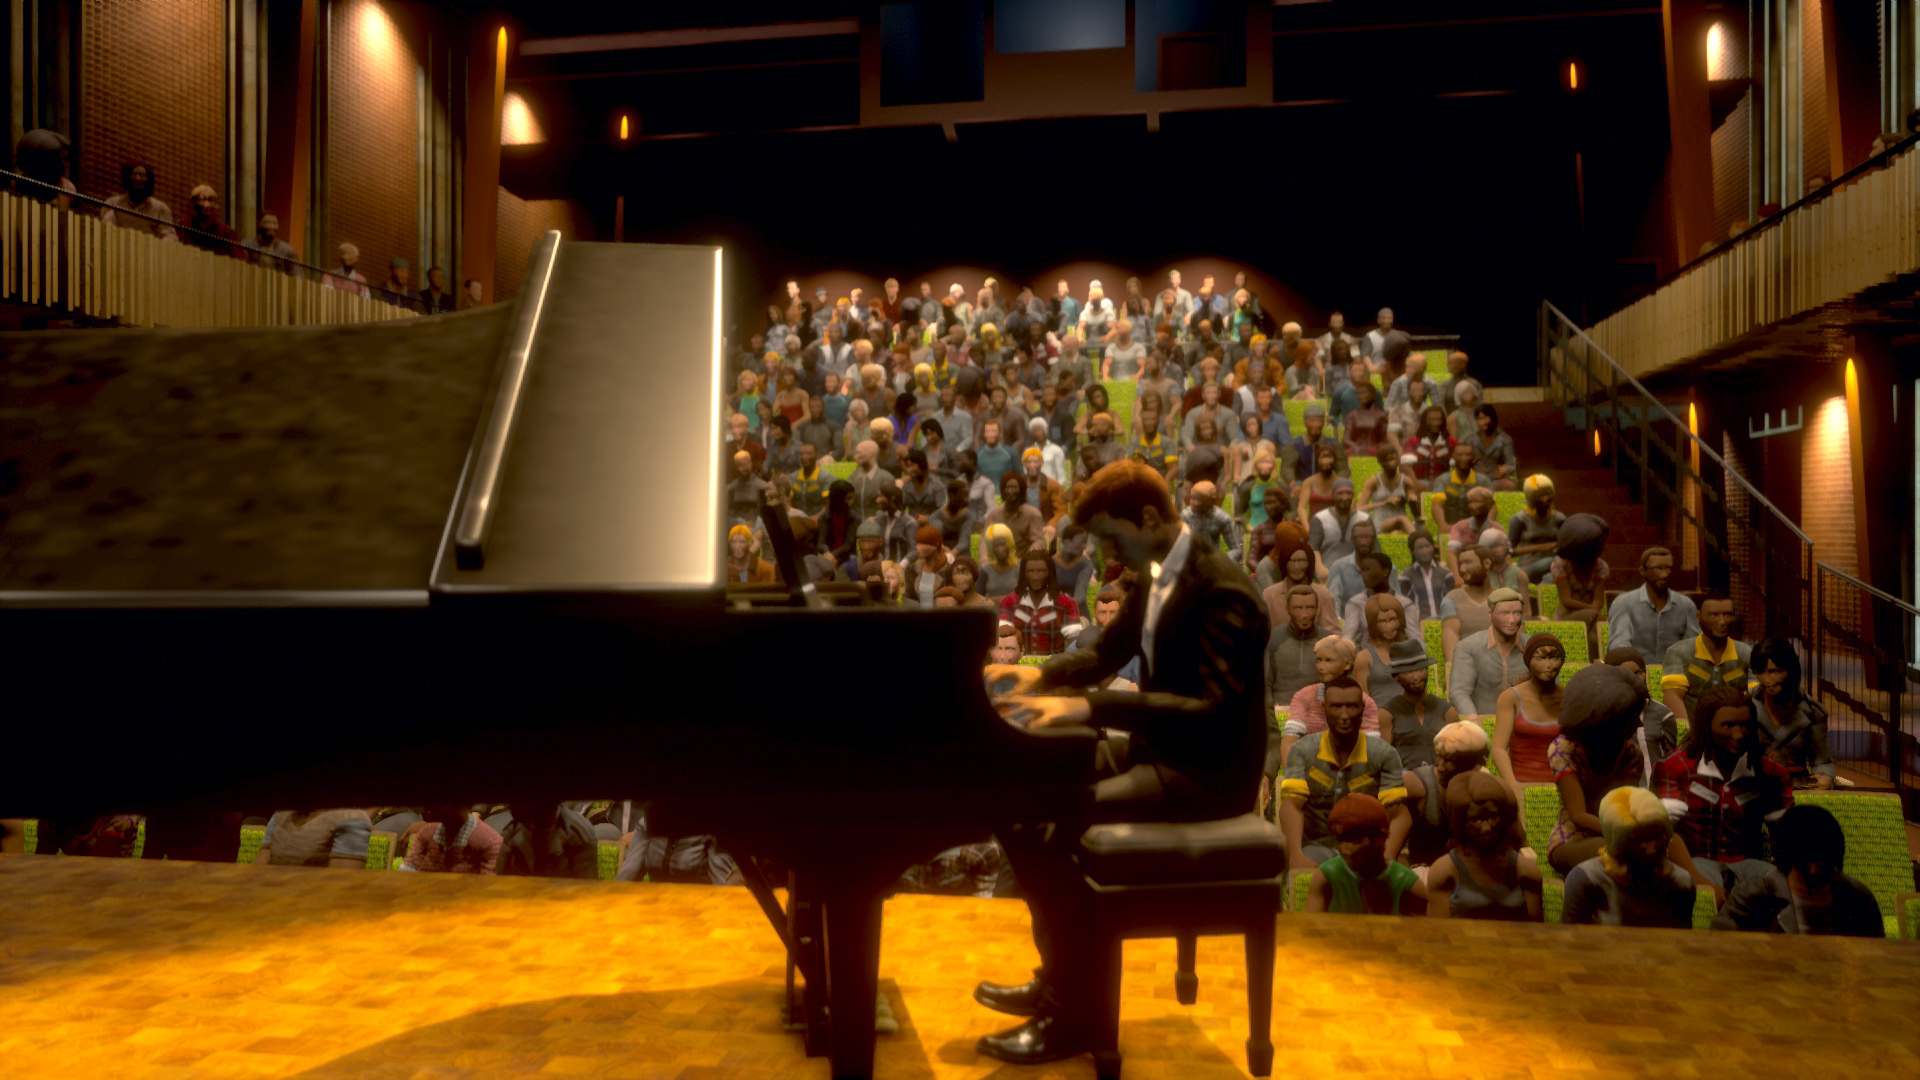 Piano Concert in the Flexible Theatre